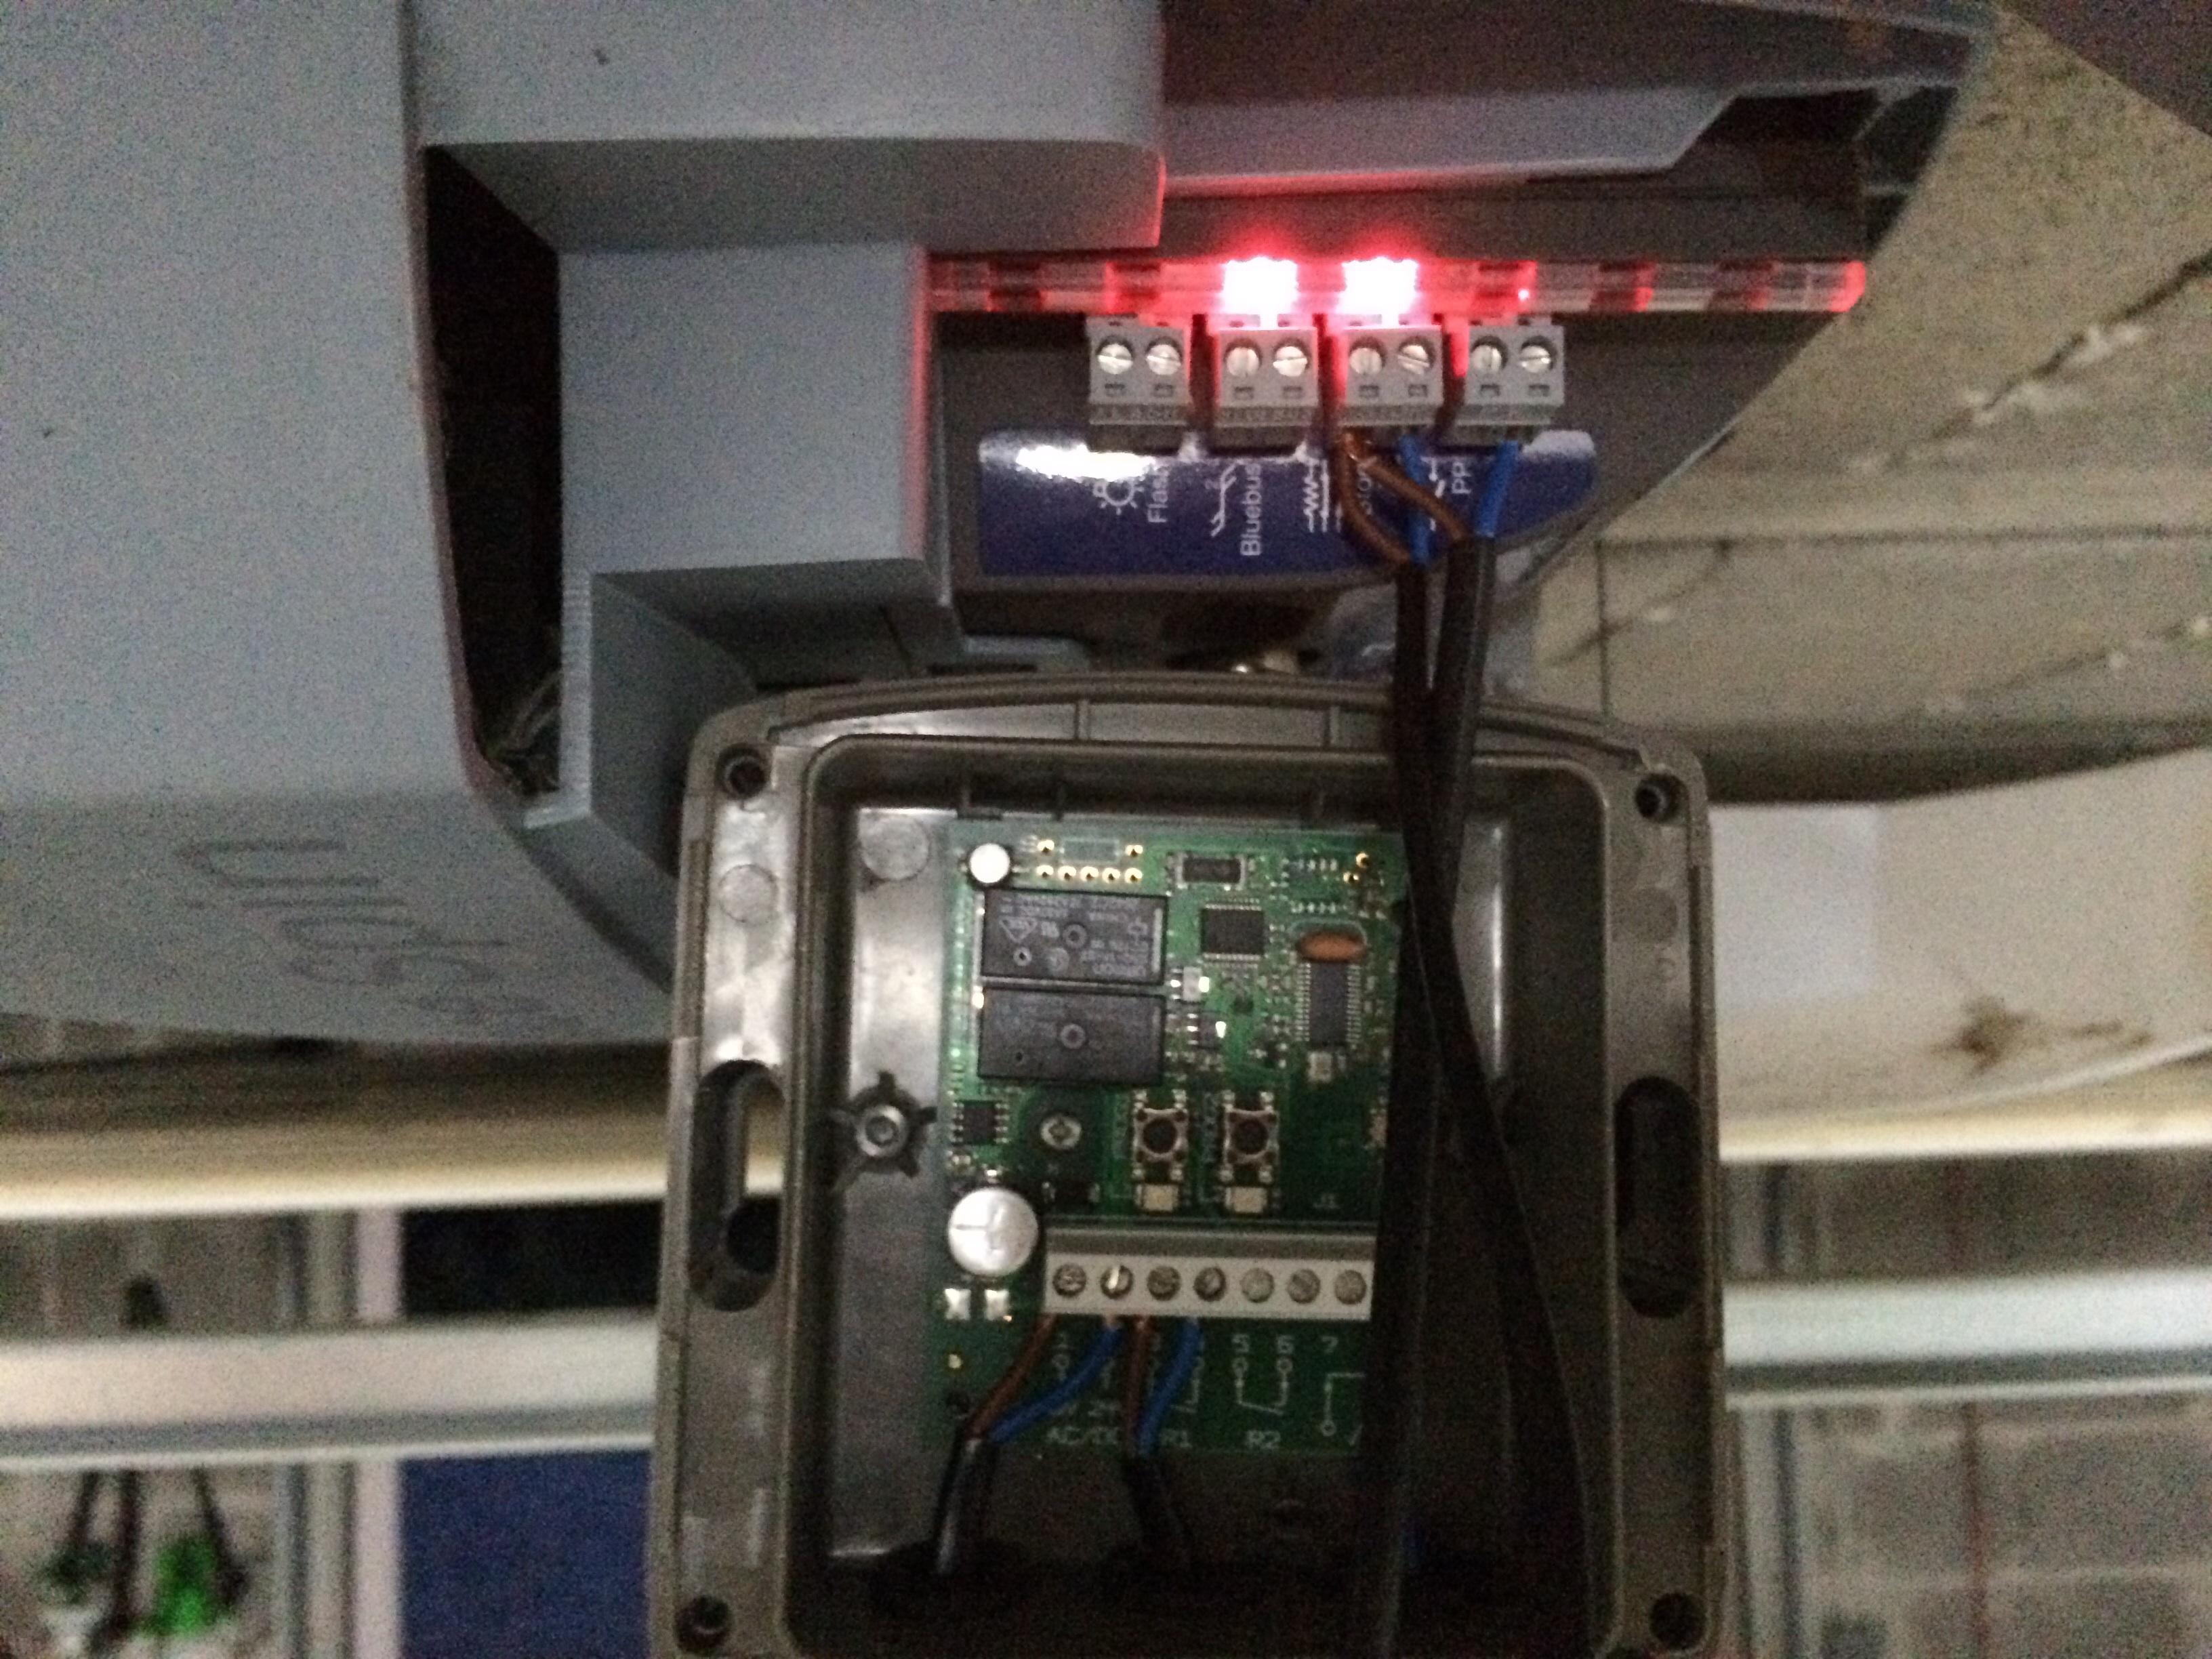 Installation r cepteur radio somfy sur moteur nice spin for Installation porte de garage nice